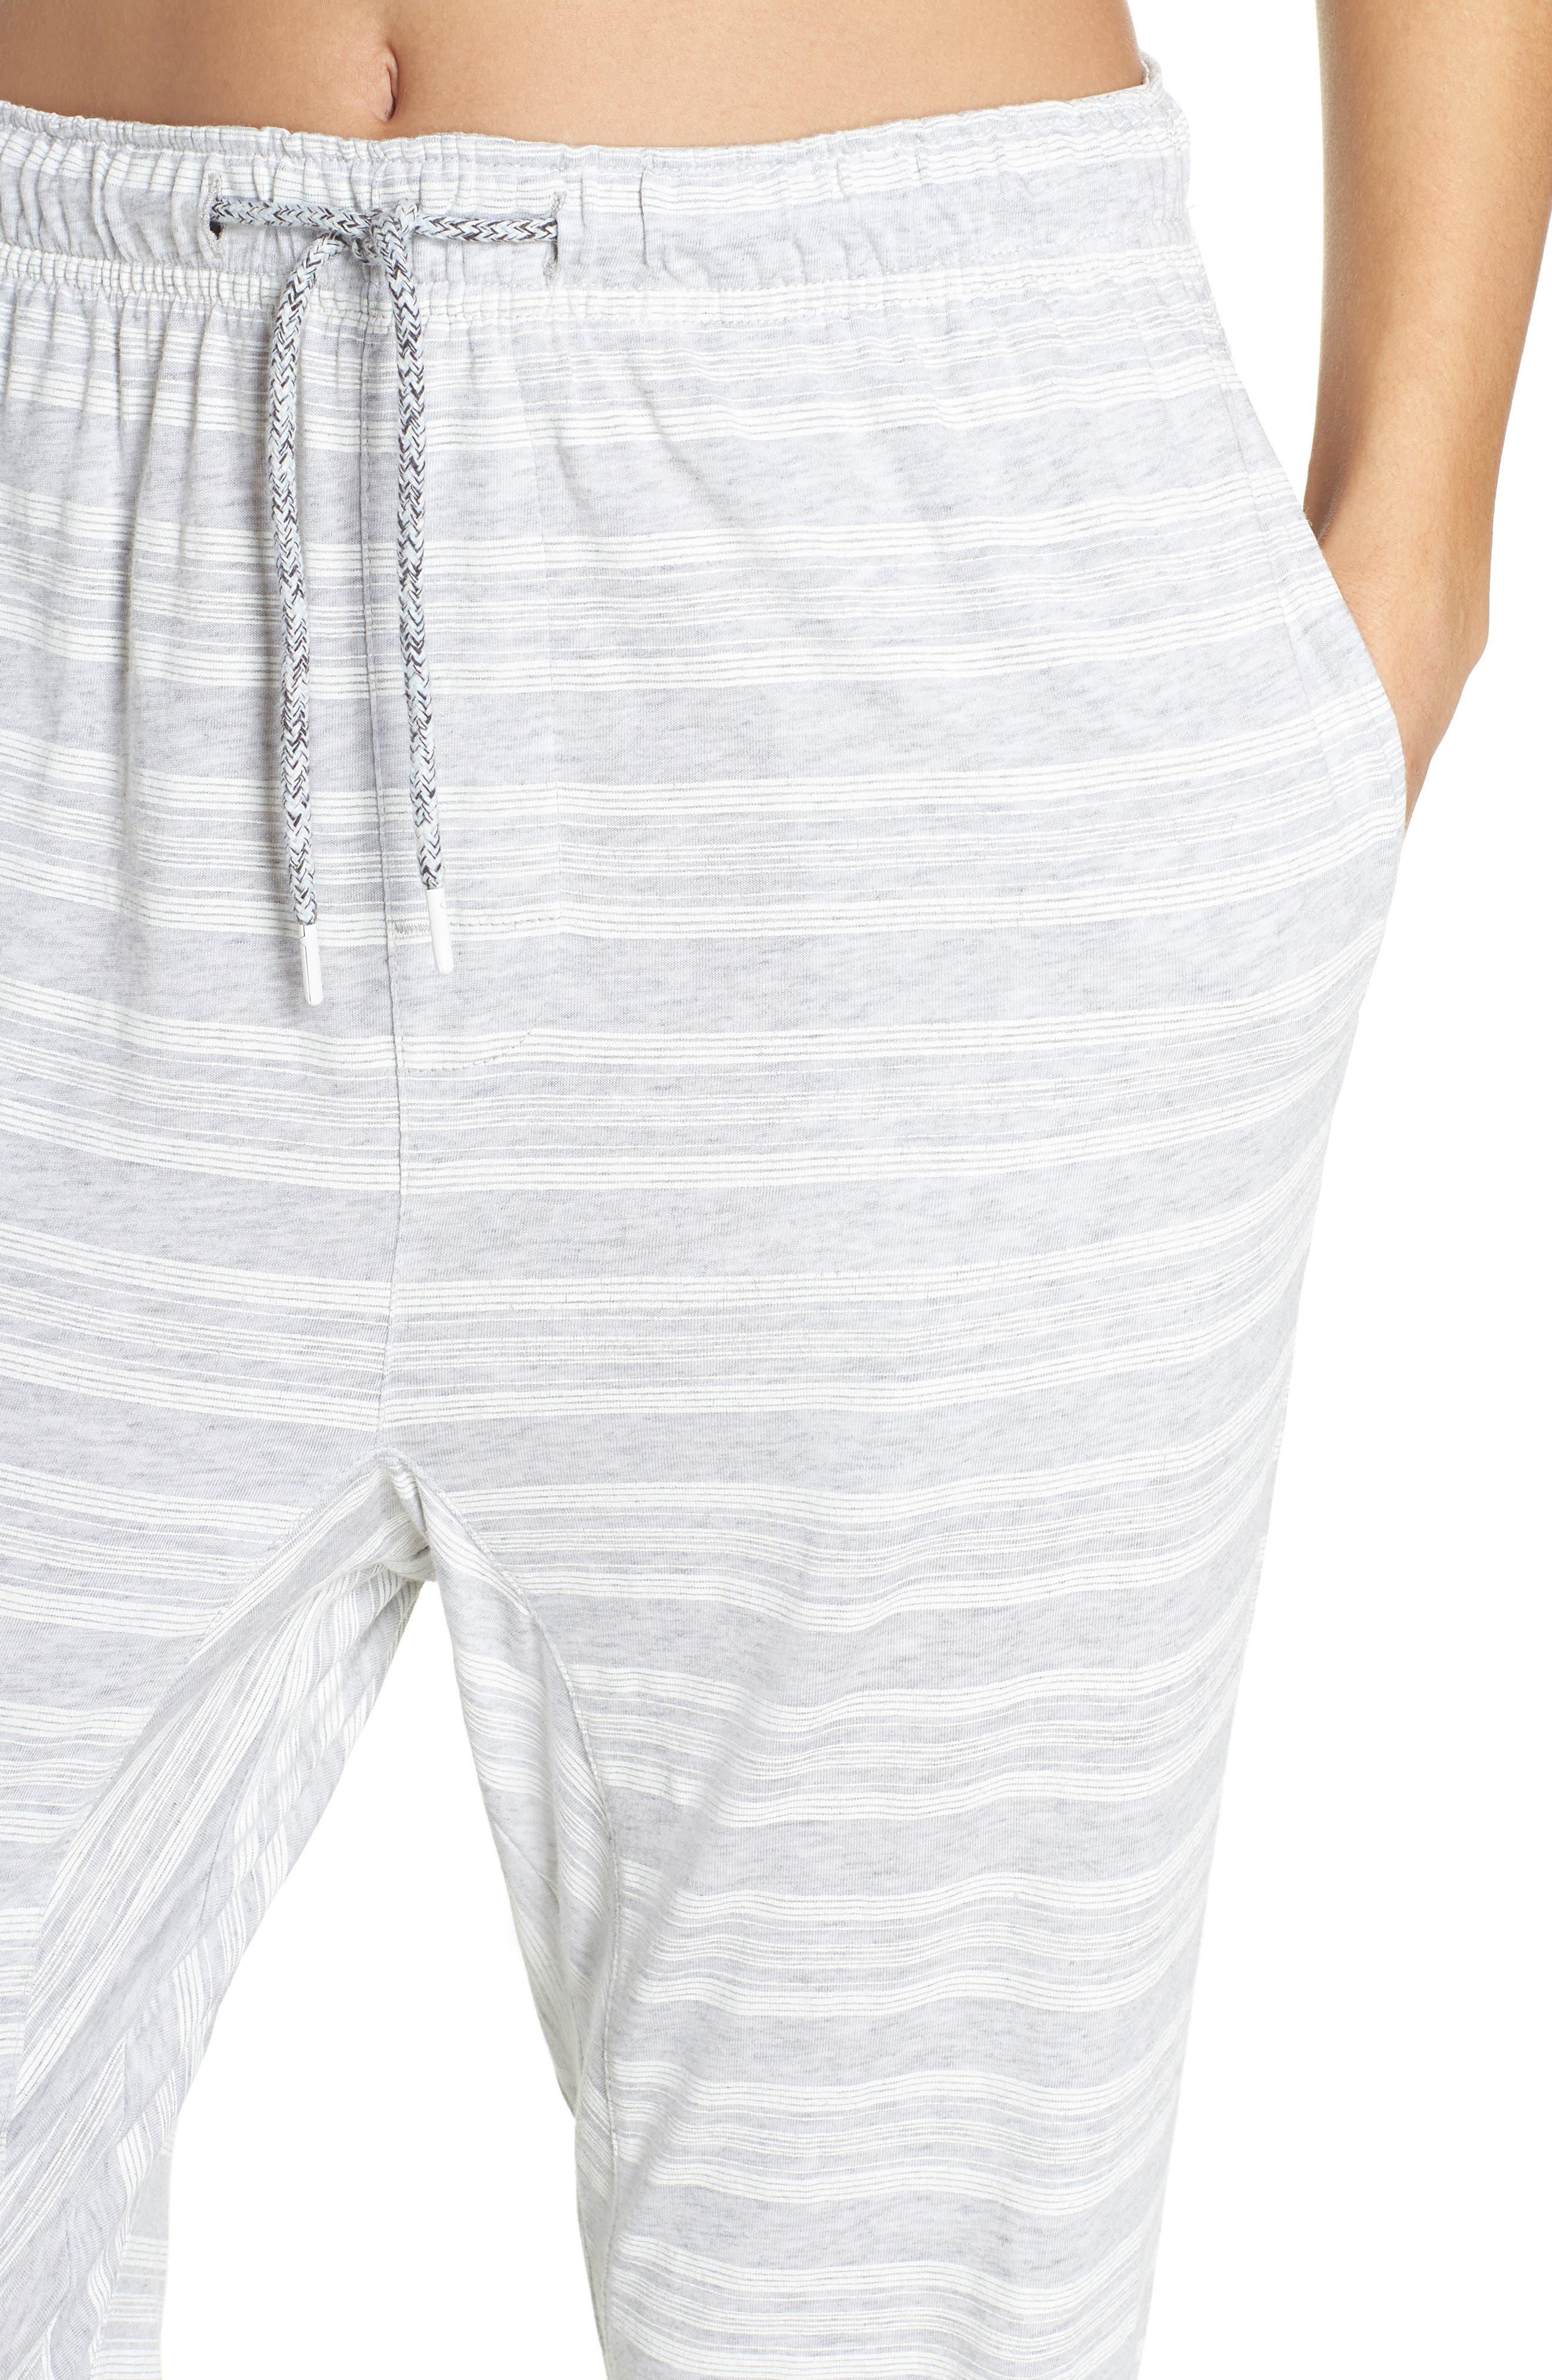 Alice Pajama Pants,                             Alternate thumbnail 4, color,                             LOLLY STRIPE WHITE